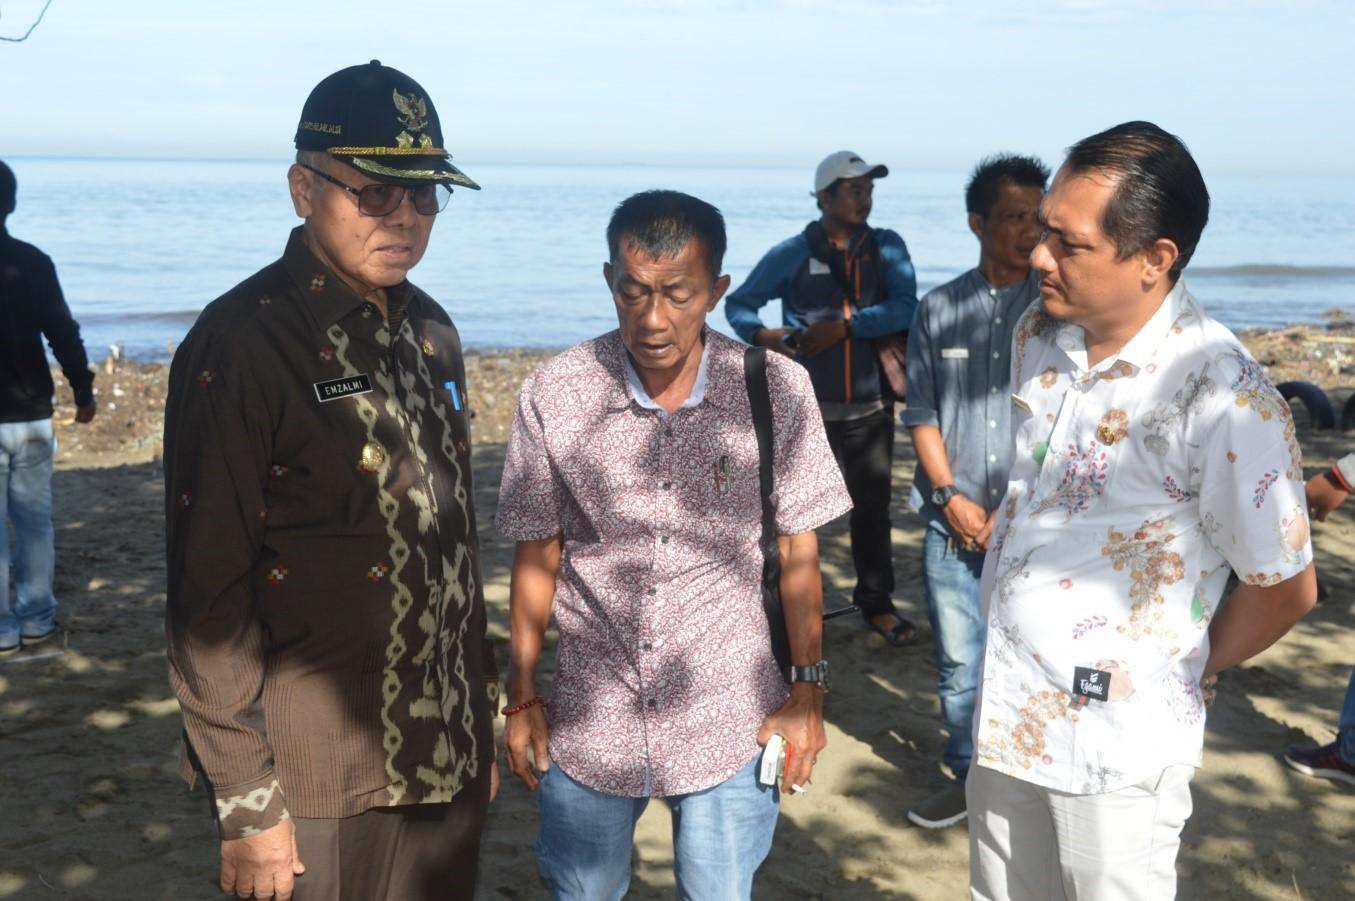 Wakil Walikota Padang Emzalmi saat melakukan peninjauan pengerukan tumpukan sampah di kawasan Muaro Lasak, Kota Padang, Kamis (12/10/2017).